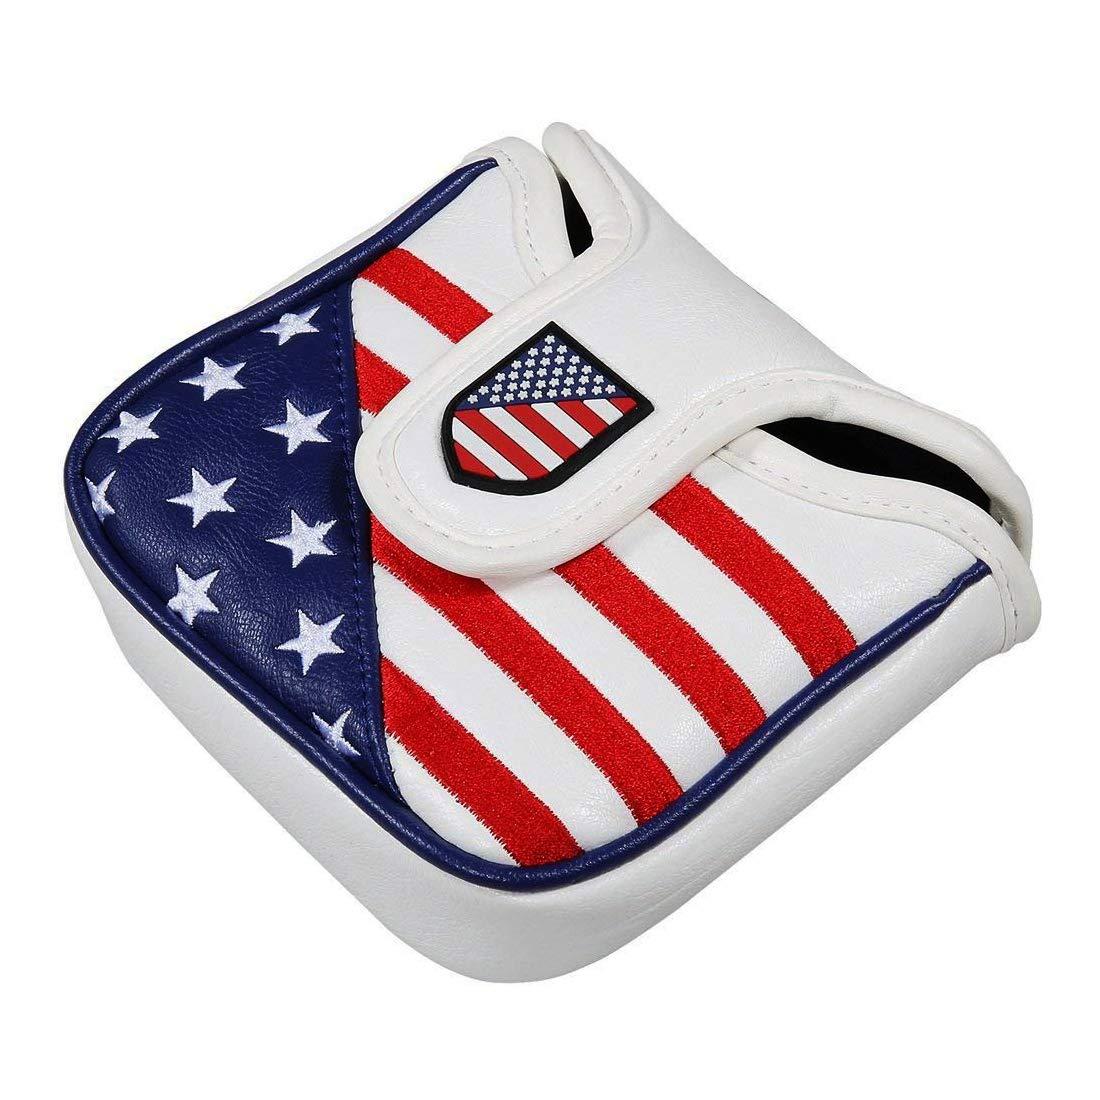 YOPRAL ゴルフ 星条旗 正方形 マレット型 マグネット開閉 ゴルフパターカバー スコッティキャメロン用 B07M8SL6R7